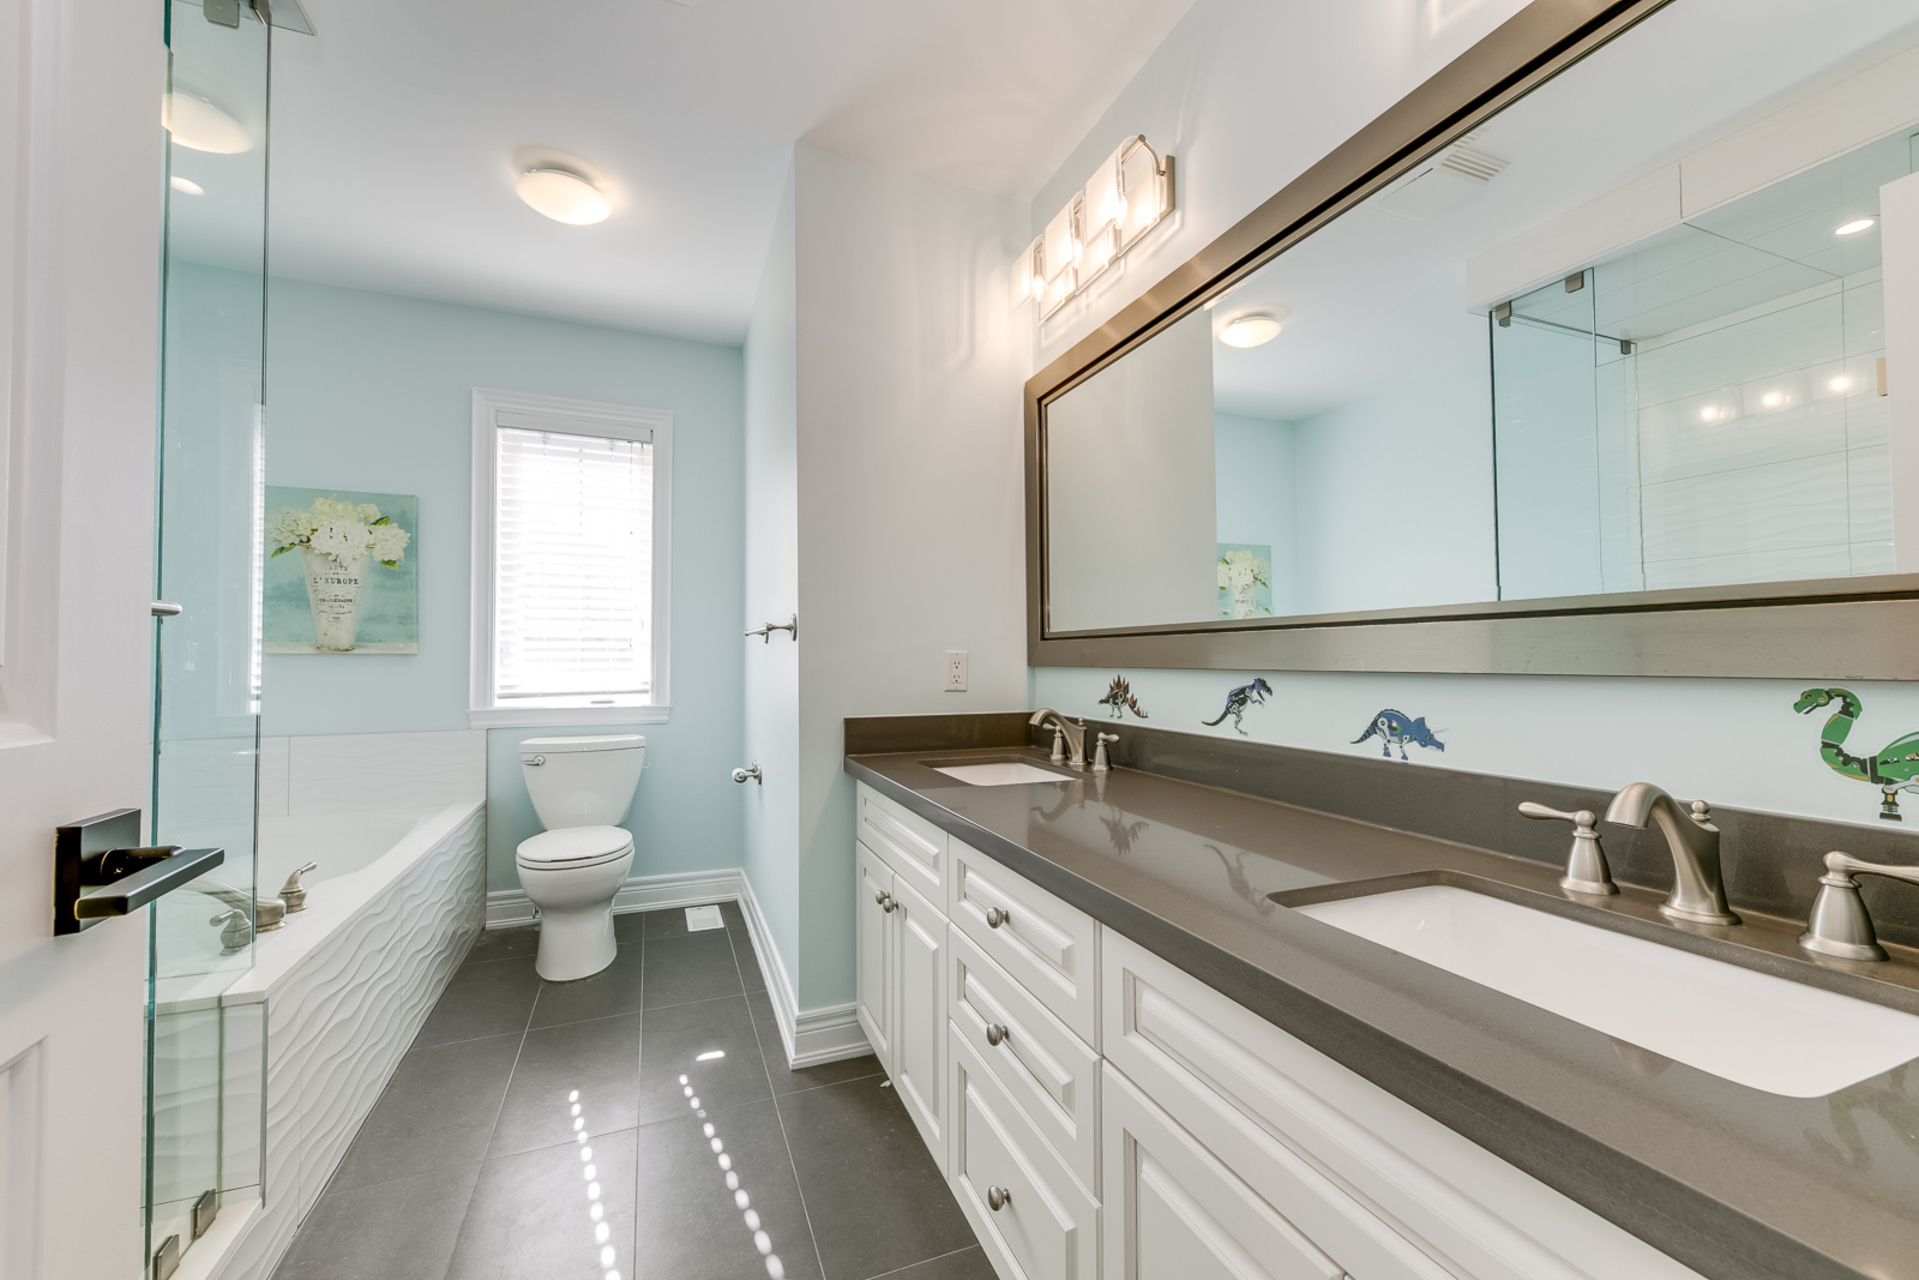 2nd Floor Main Bathroom - 2473 Eighth Line, Oakville - Elite3 & Team at 2473 Eighth Line, Iroquois Ridge North, Oakville